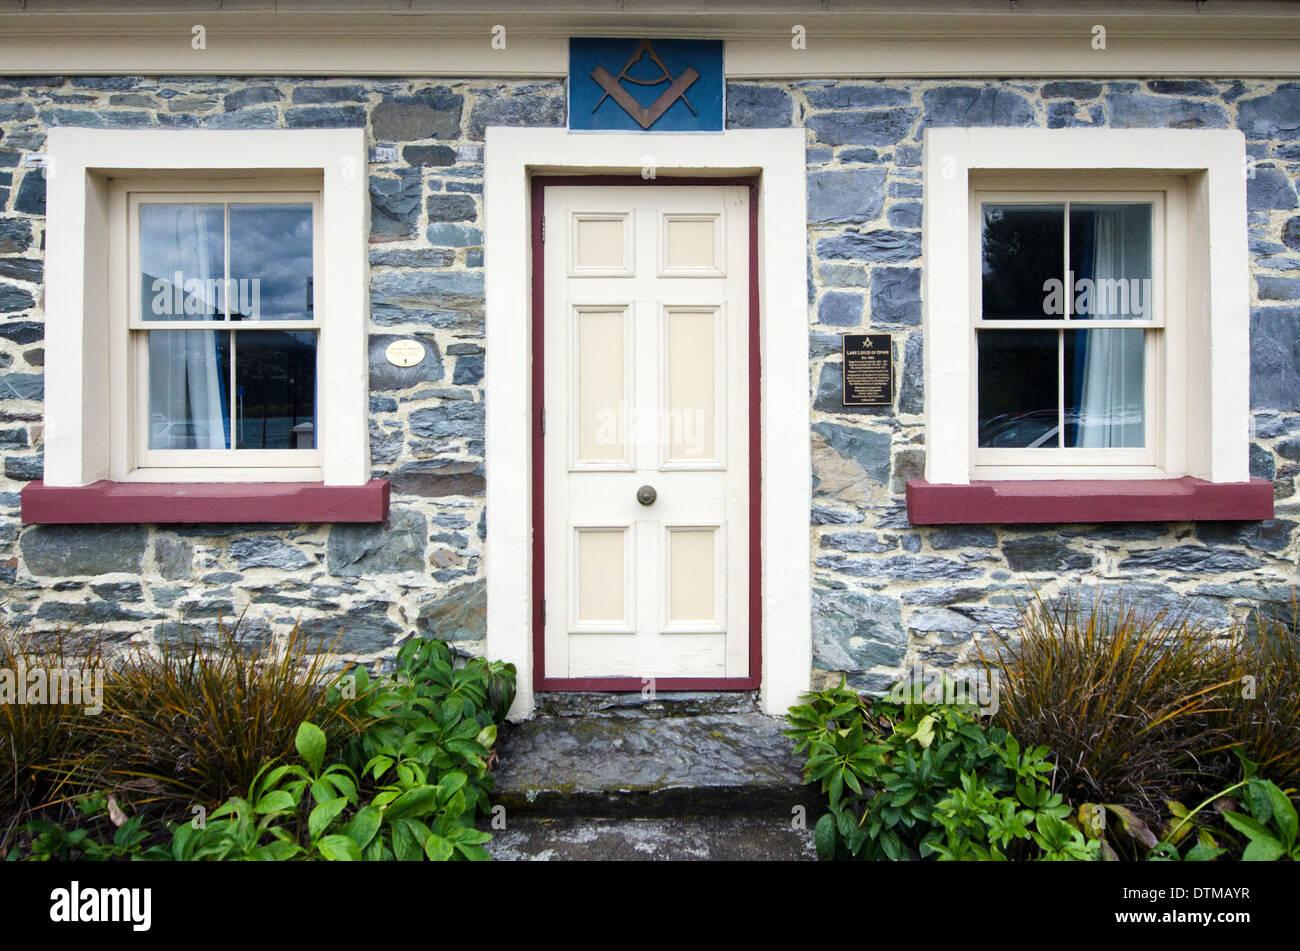 The Freemasonry Queenstown Lodge, New Zealand - Stock Image